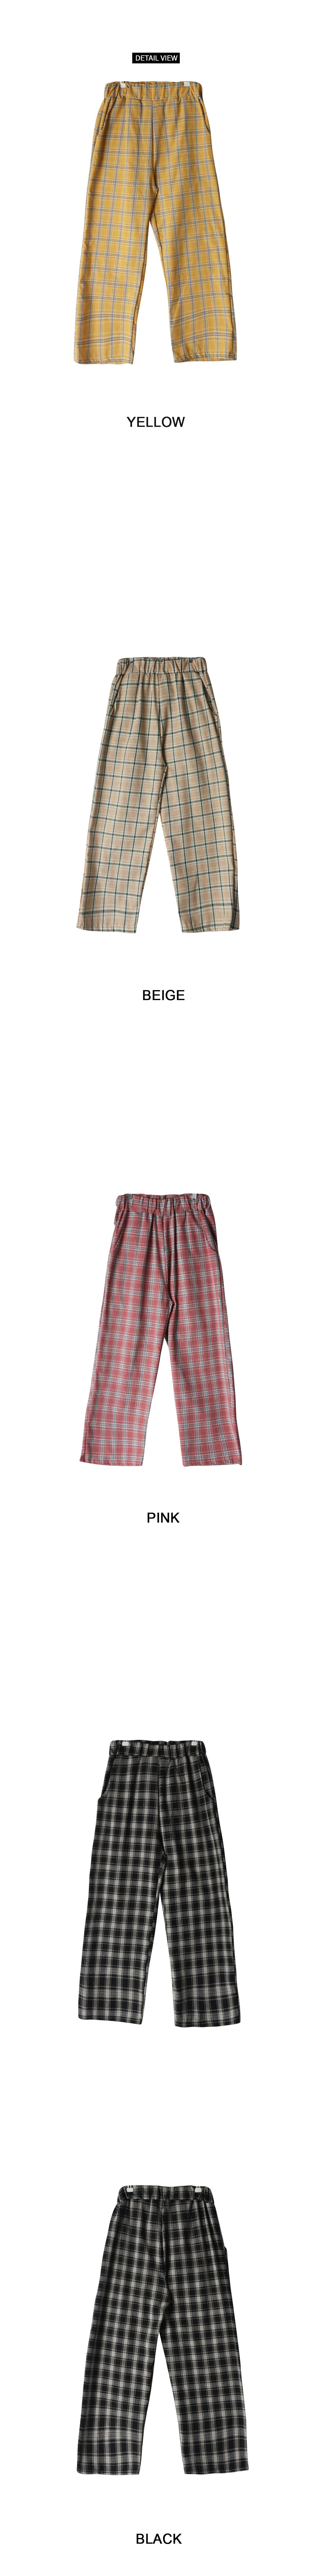 Return Check Bending Pants